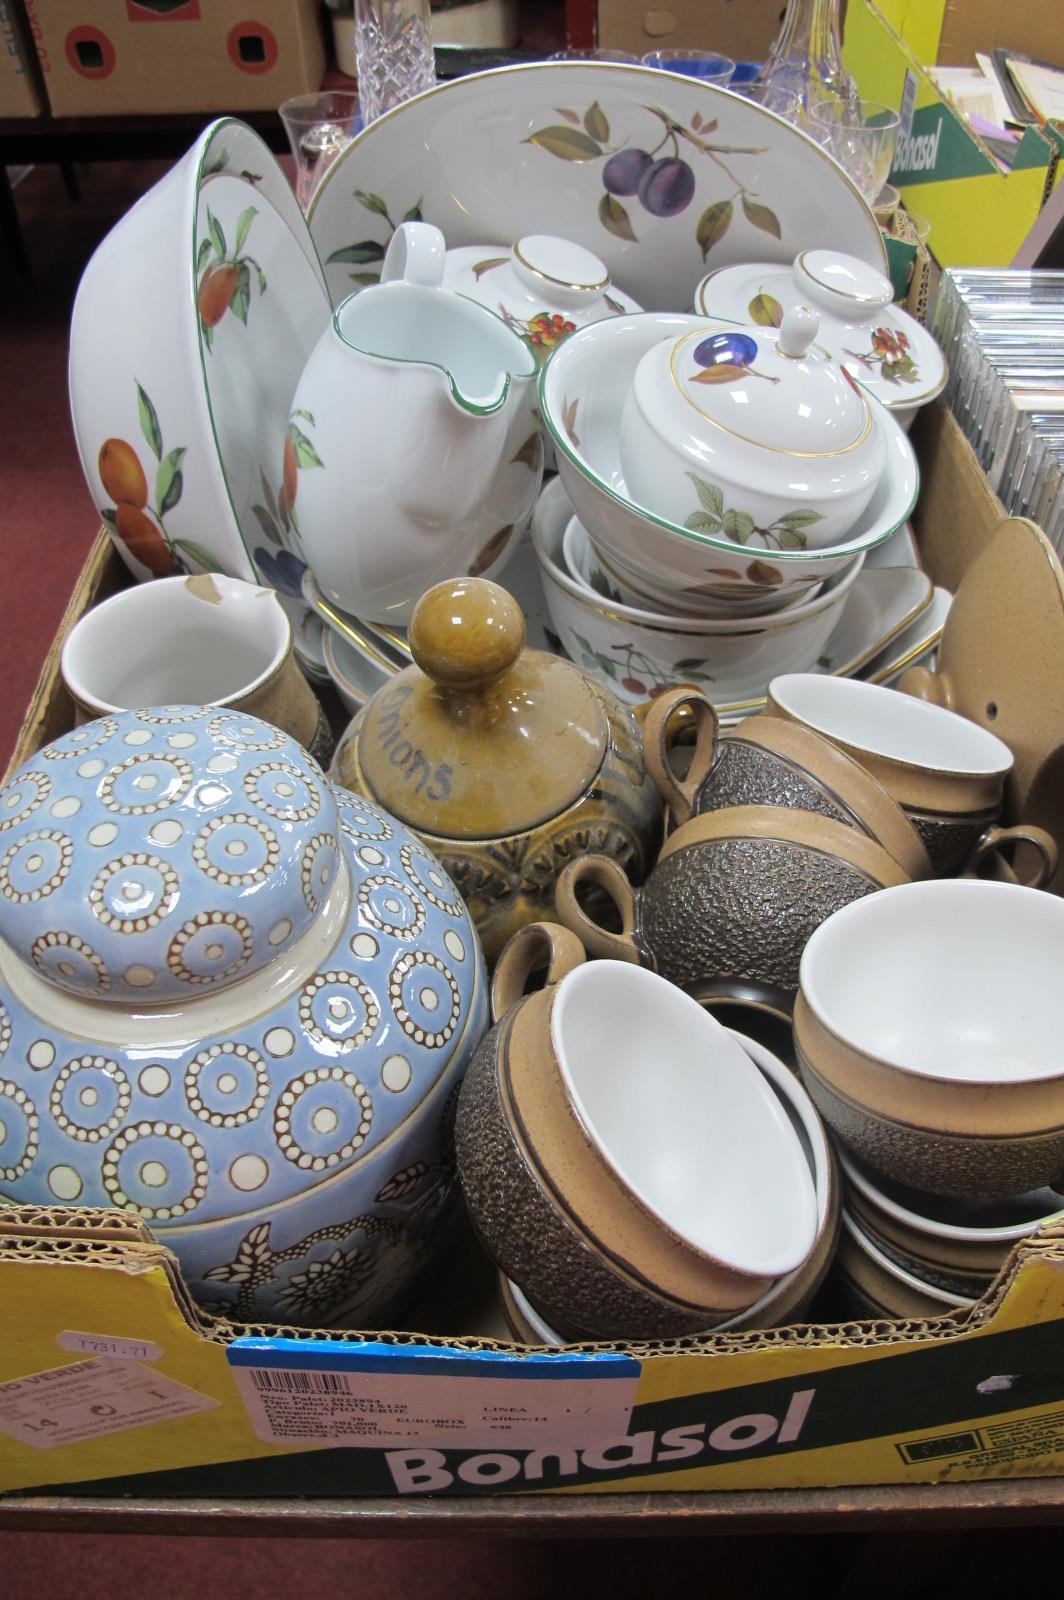 Royal Worcester 'Evesham' Table Pottery and Storage Jars, Denby 'Cotswold' pottery, ginger jar:- One